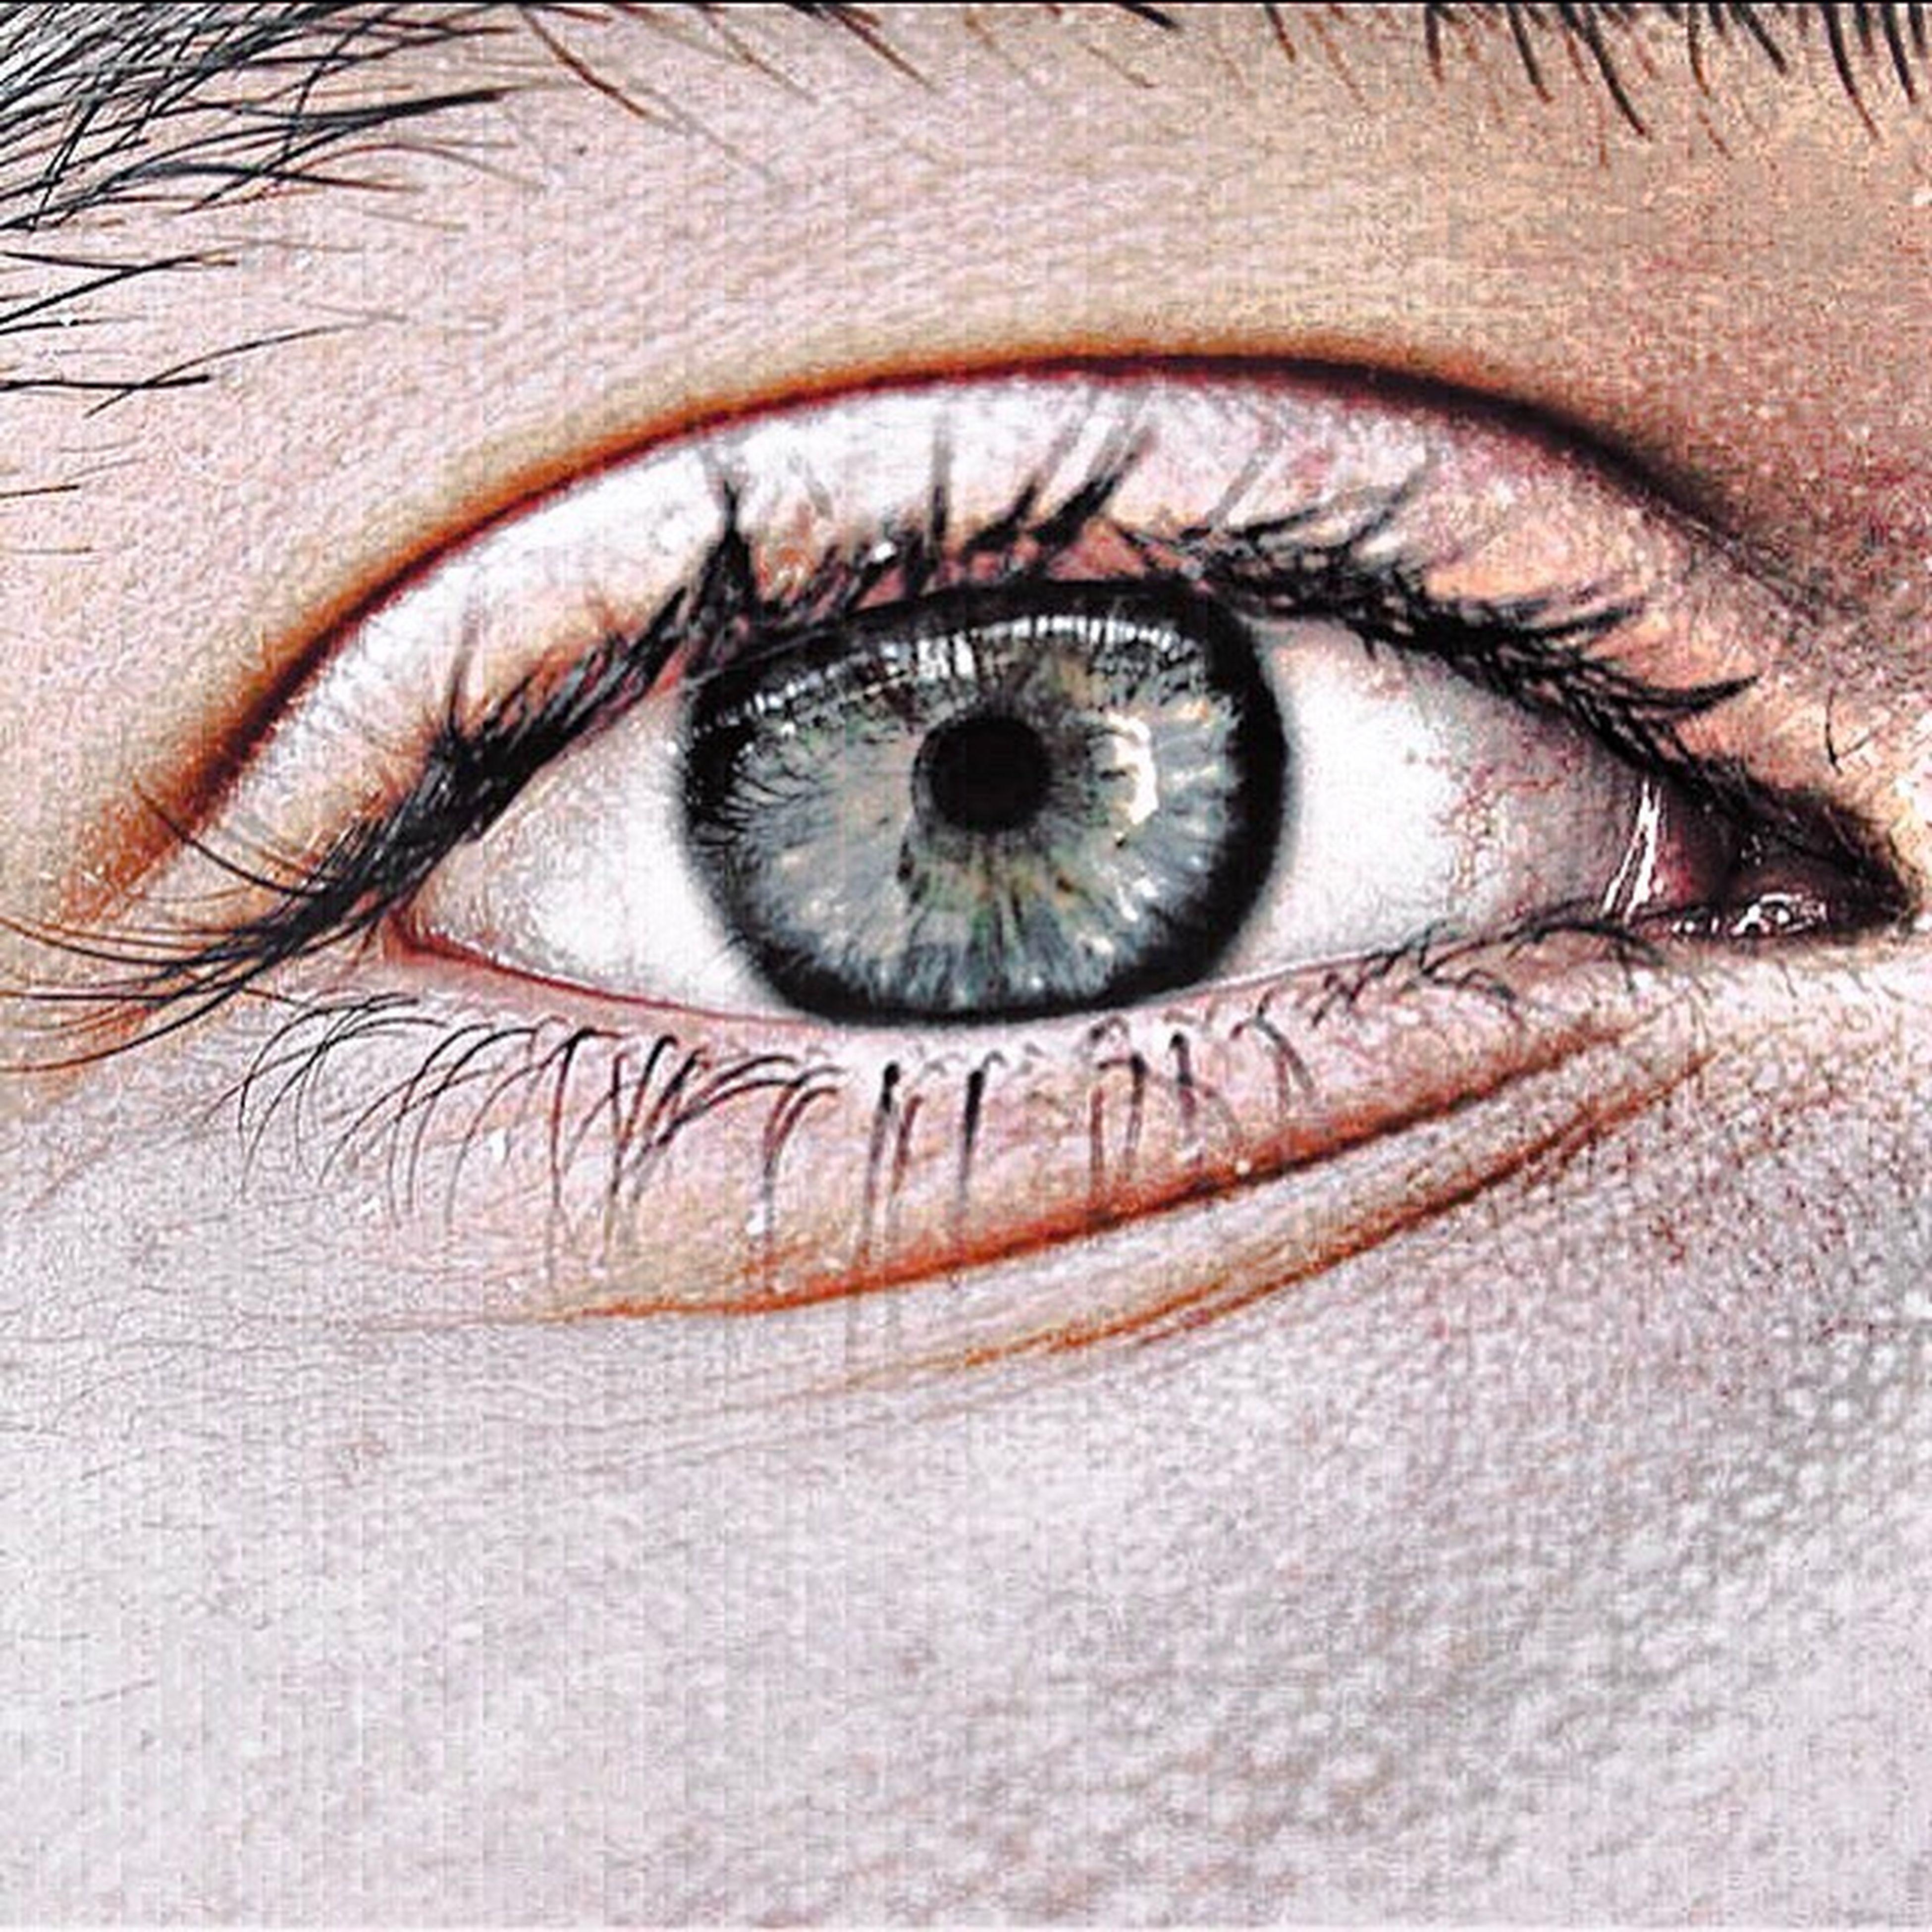 part of, human eye, eyesight, eyelash, unrecognizable person, close-up, extreme close-up, backgrounds, sensory perception, extreme close up, looking at camera, human skin, full frame, person, macro, eyeball, vision, iris - eye, focus on foreground, studio shot